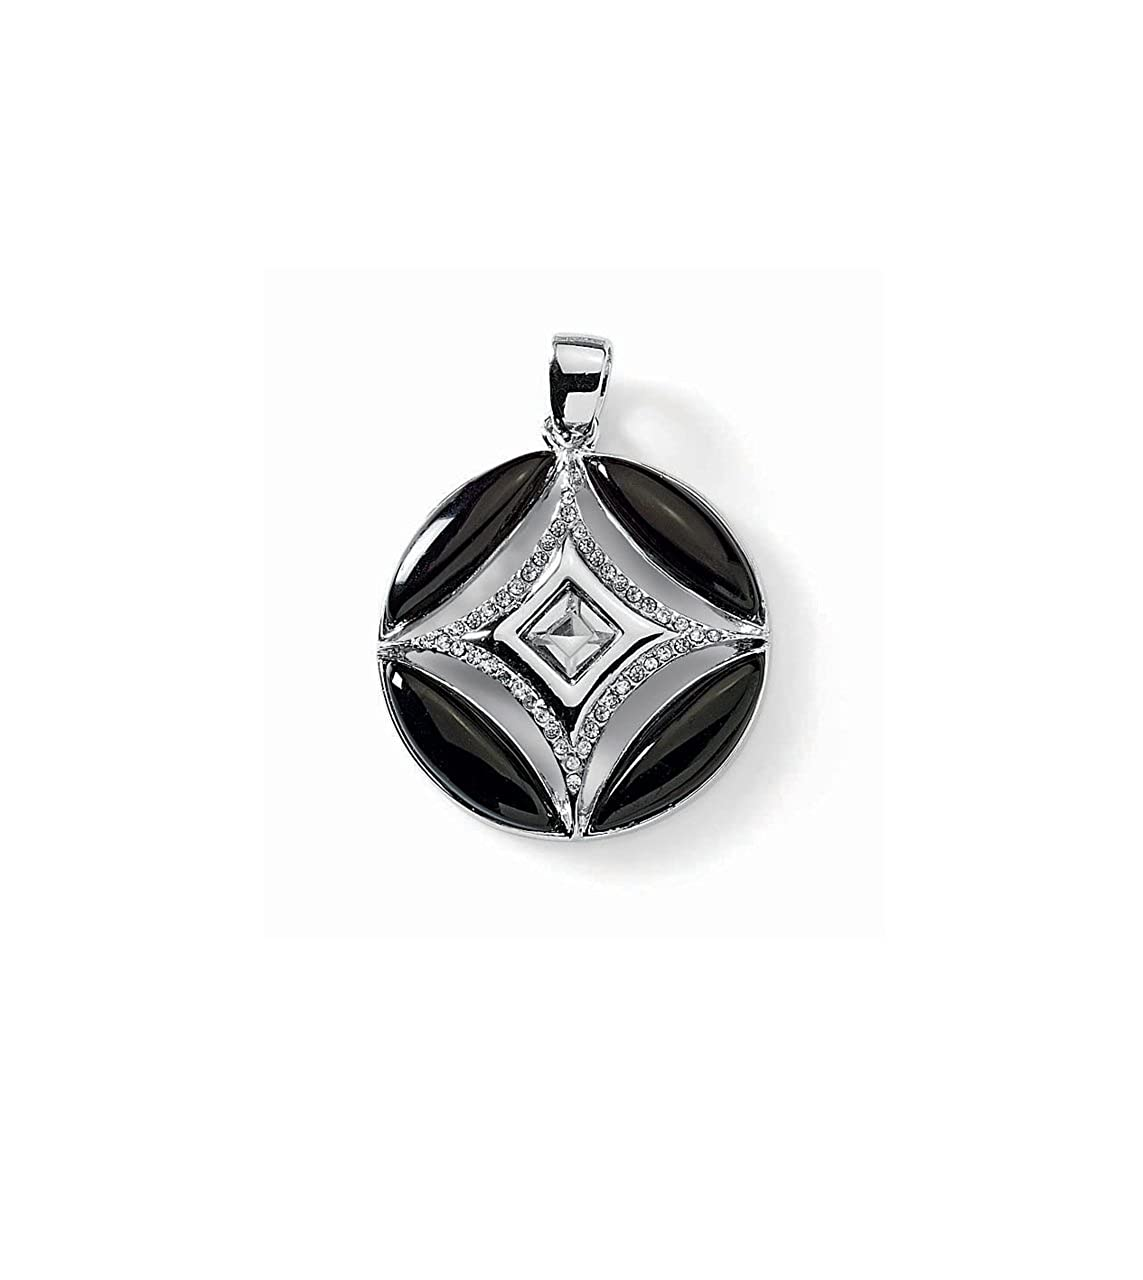 ON TARGET retired lia sophia pendant